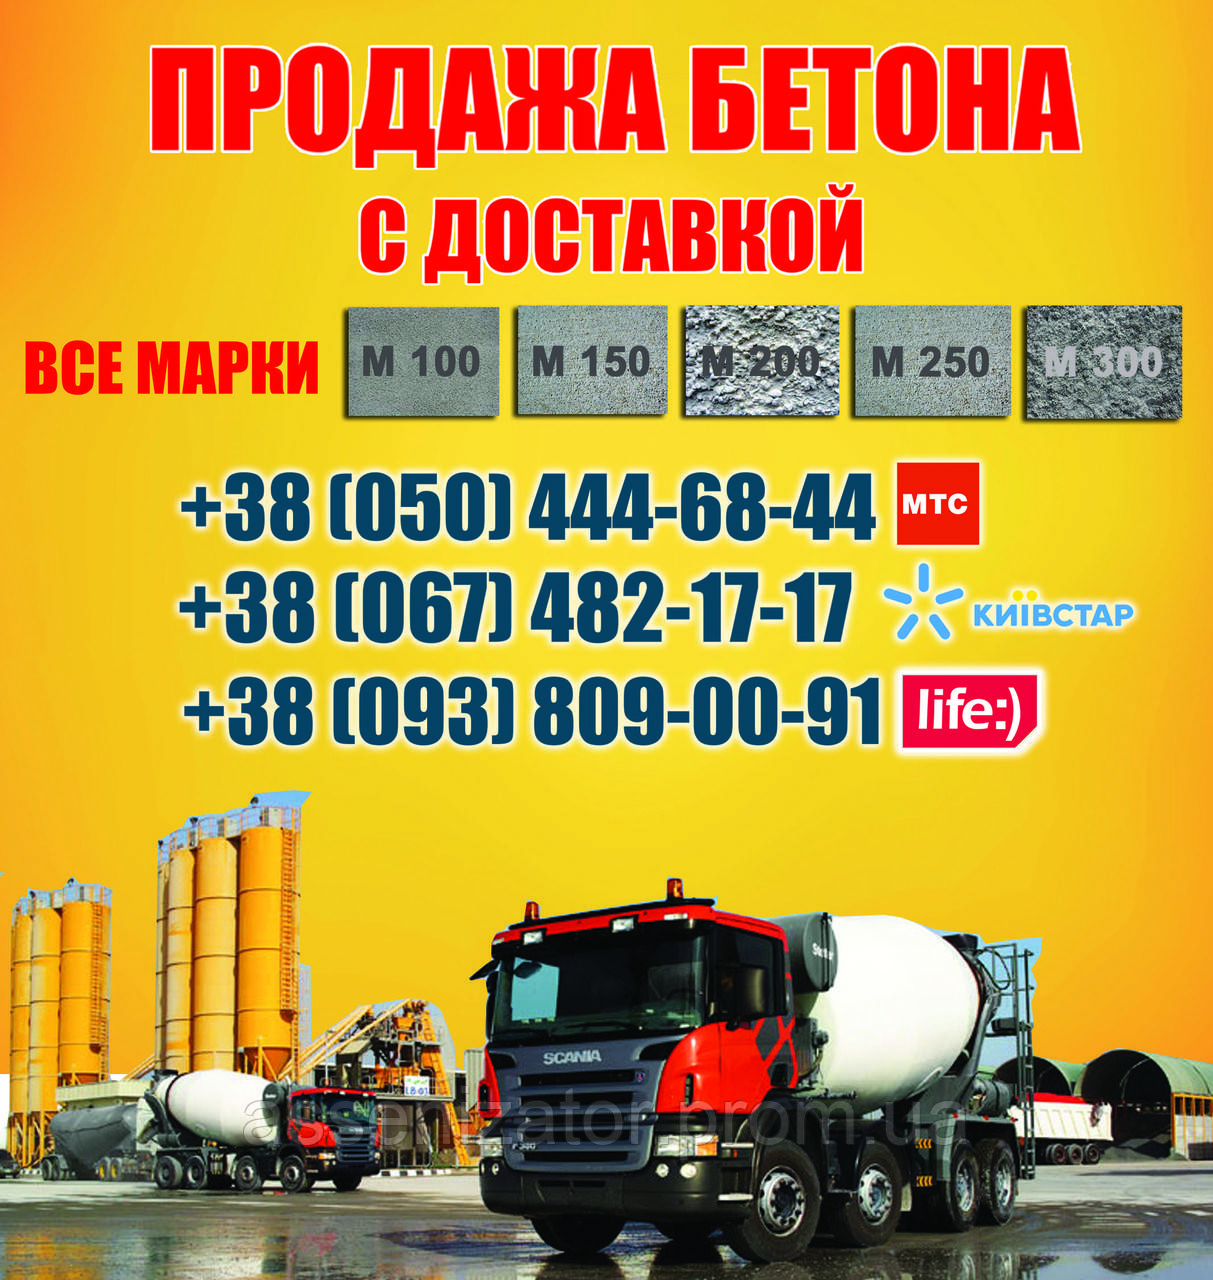 Бетон купить в луганске цистерна бетон